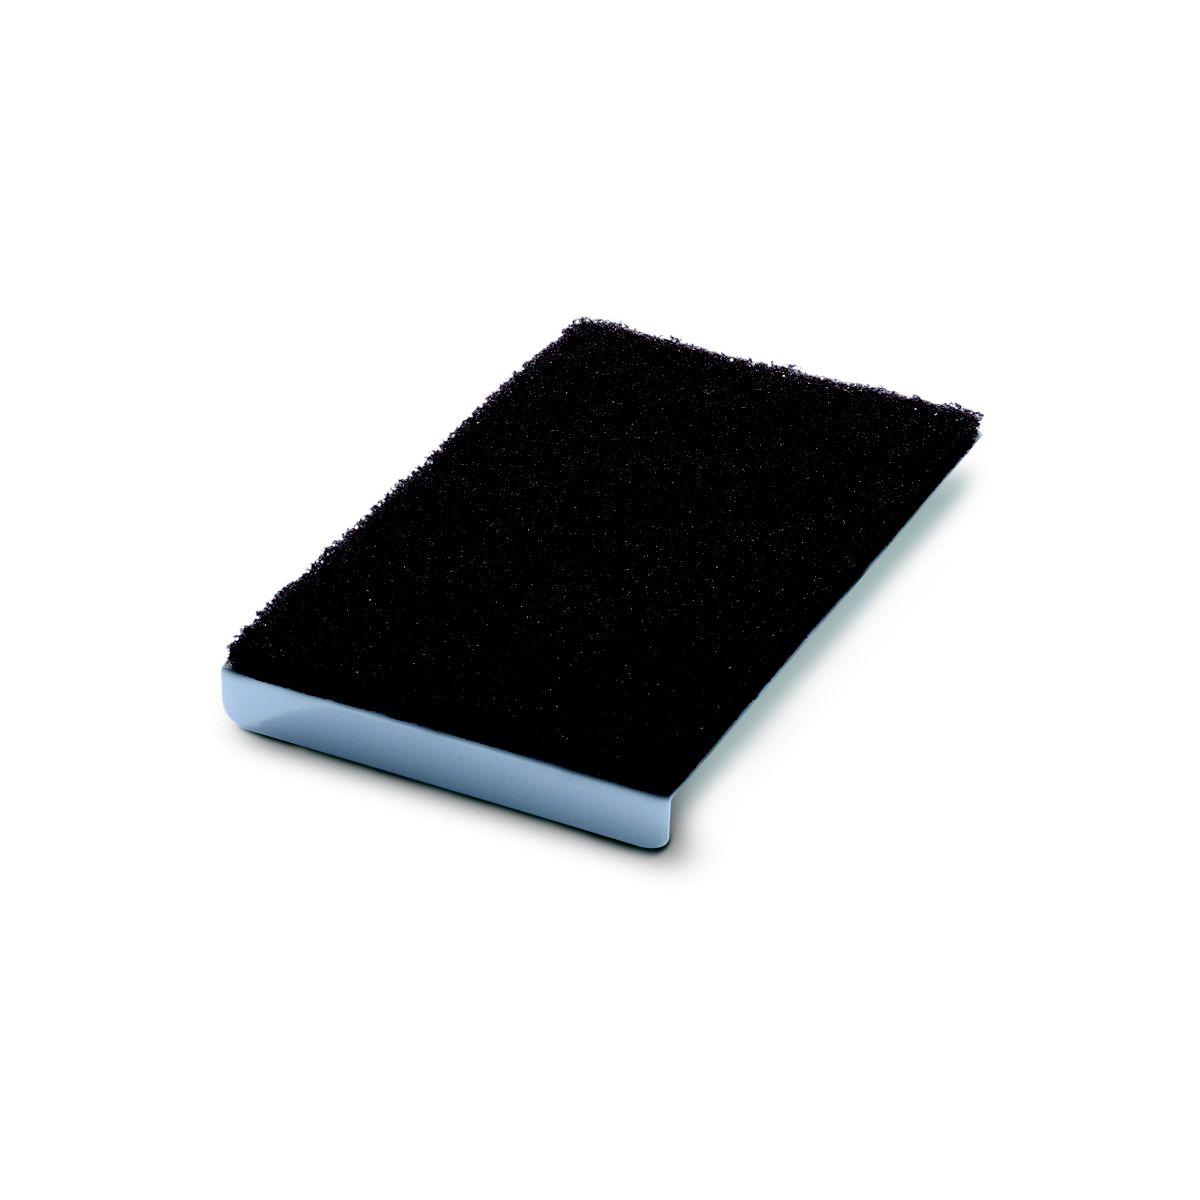 Accessoire LAURASTAR tapis pour nettoyer la semelle du fer